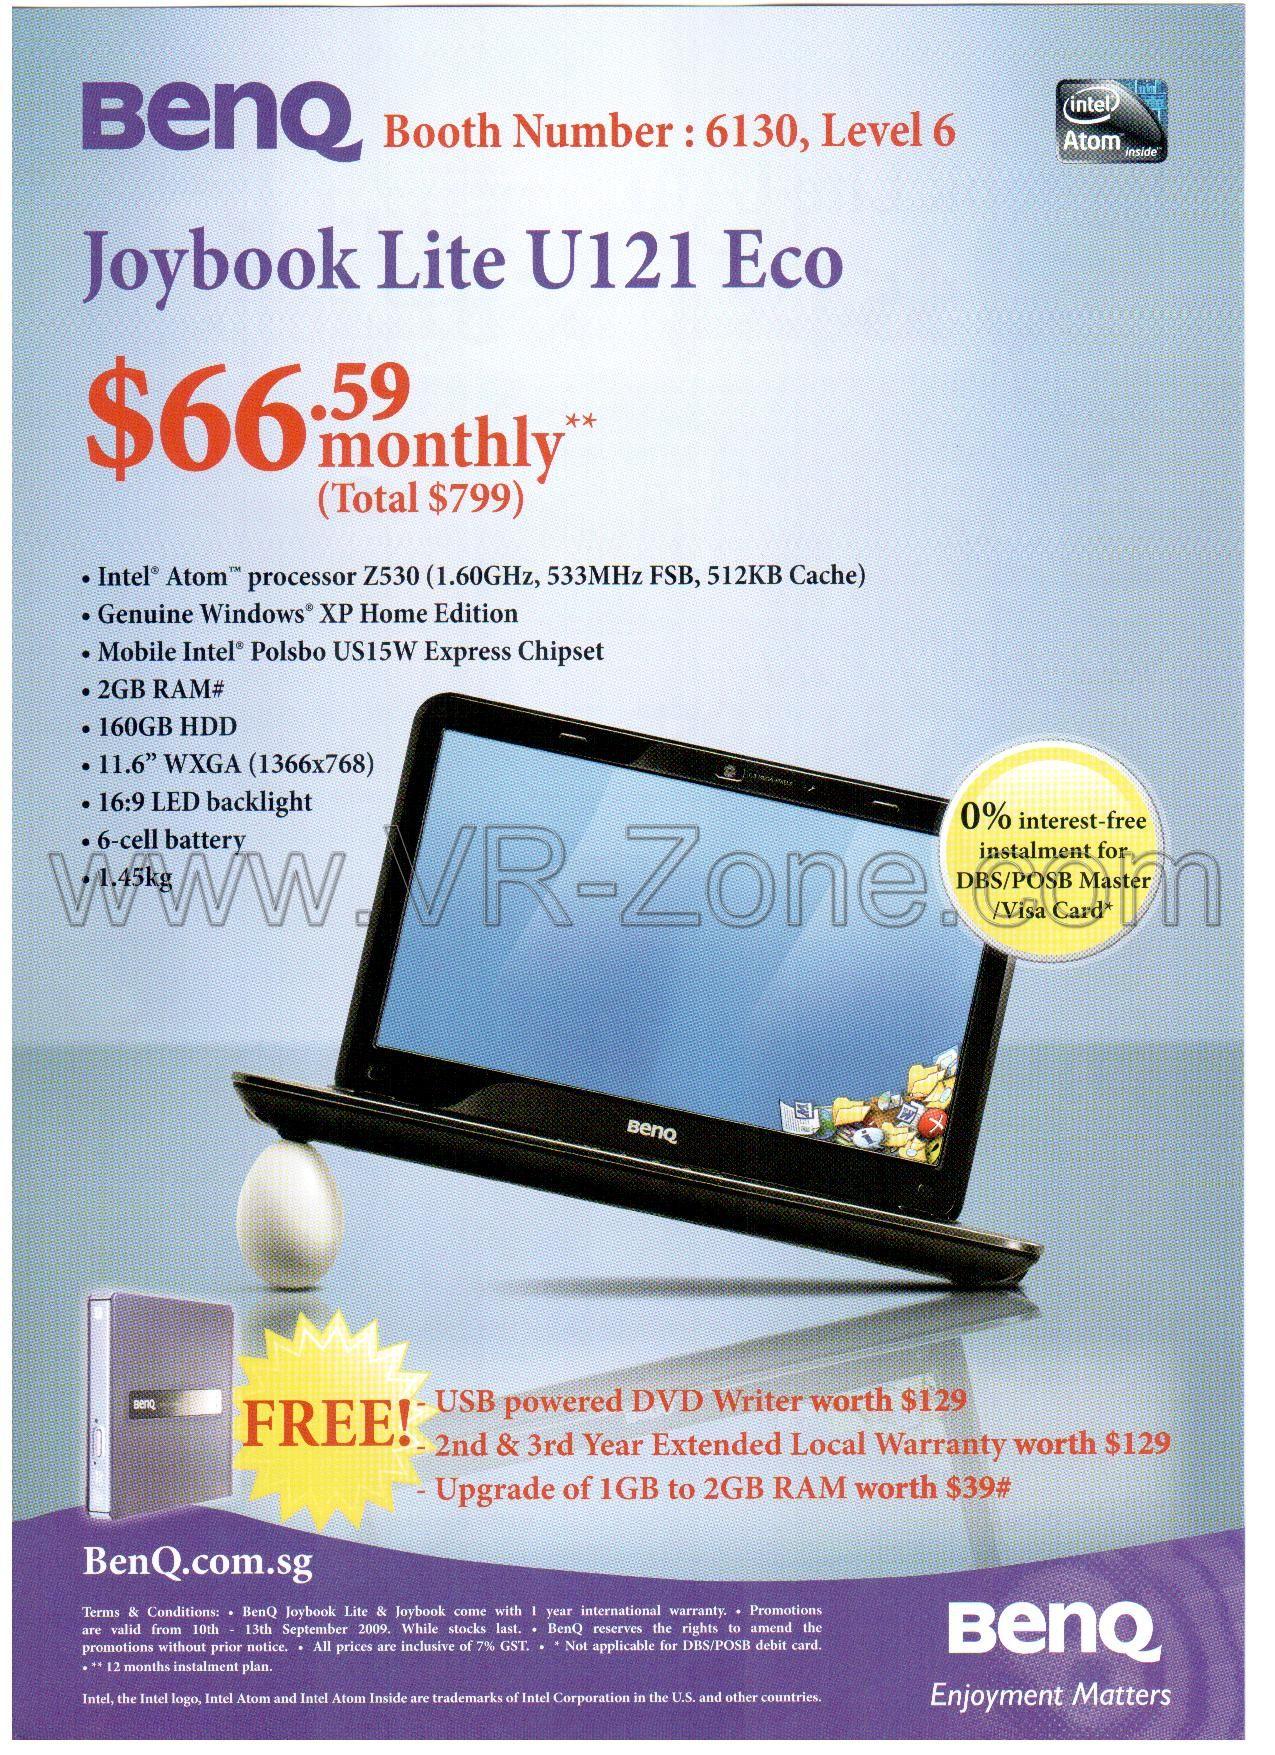 Comex 2009 price list image brochure of BenQ Netbook Joybook Lite U121 Eco